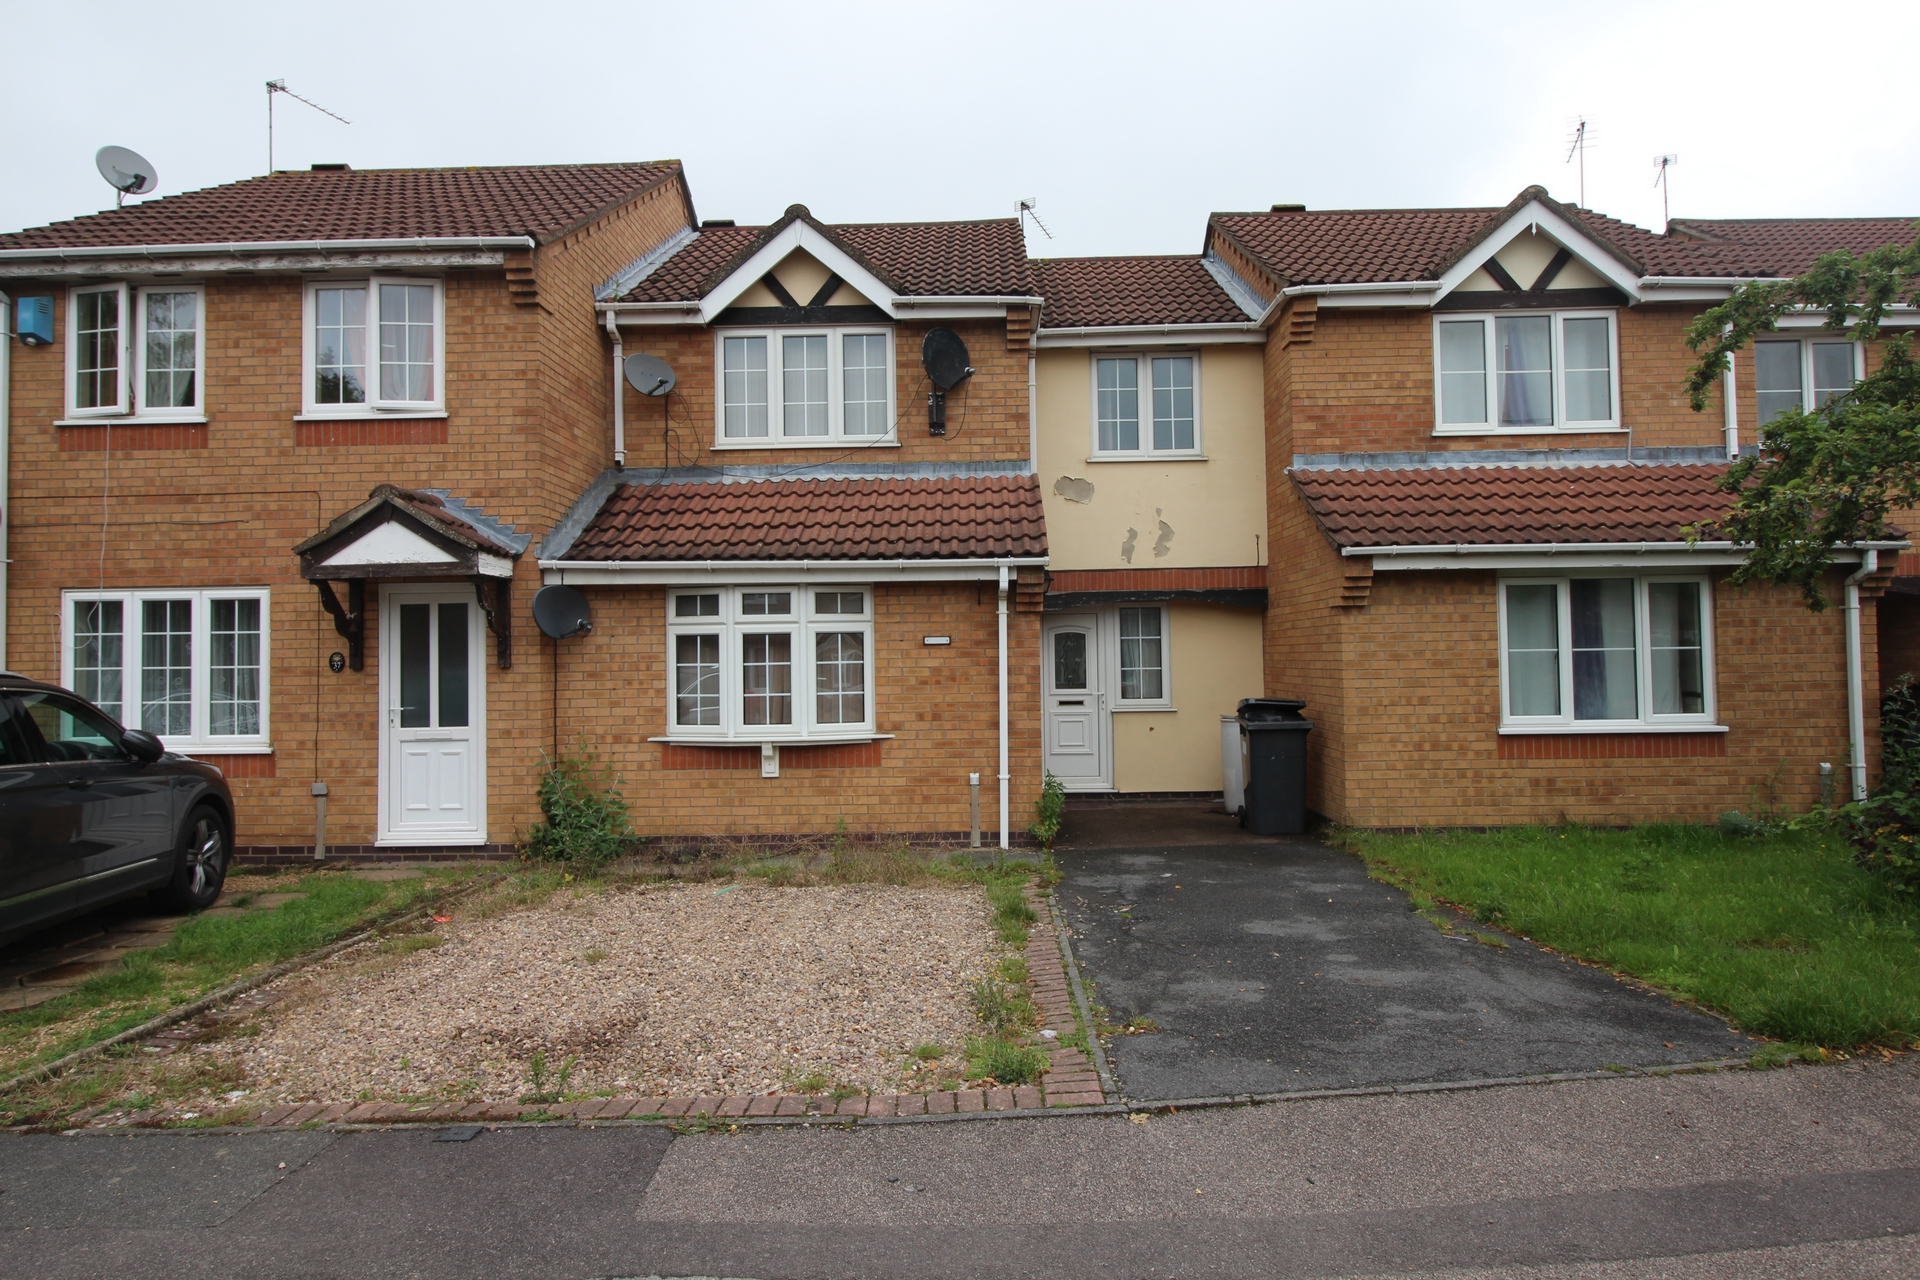 Photo 1, Burnet Close, Leicester, LE5